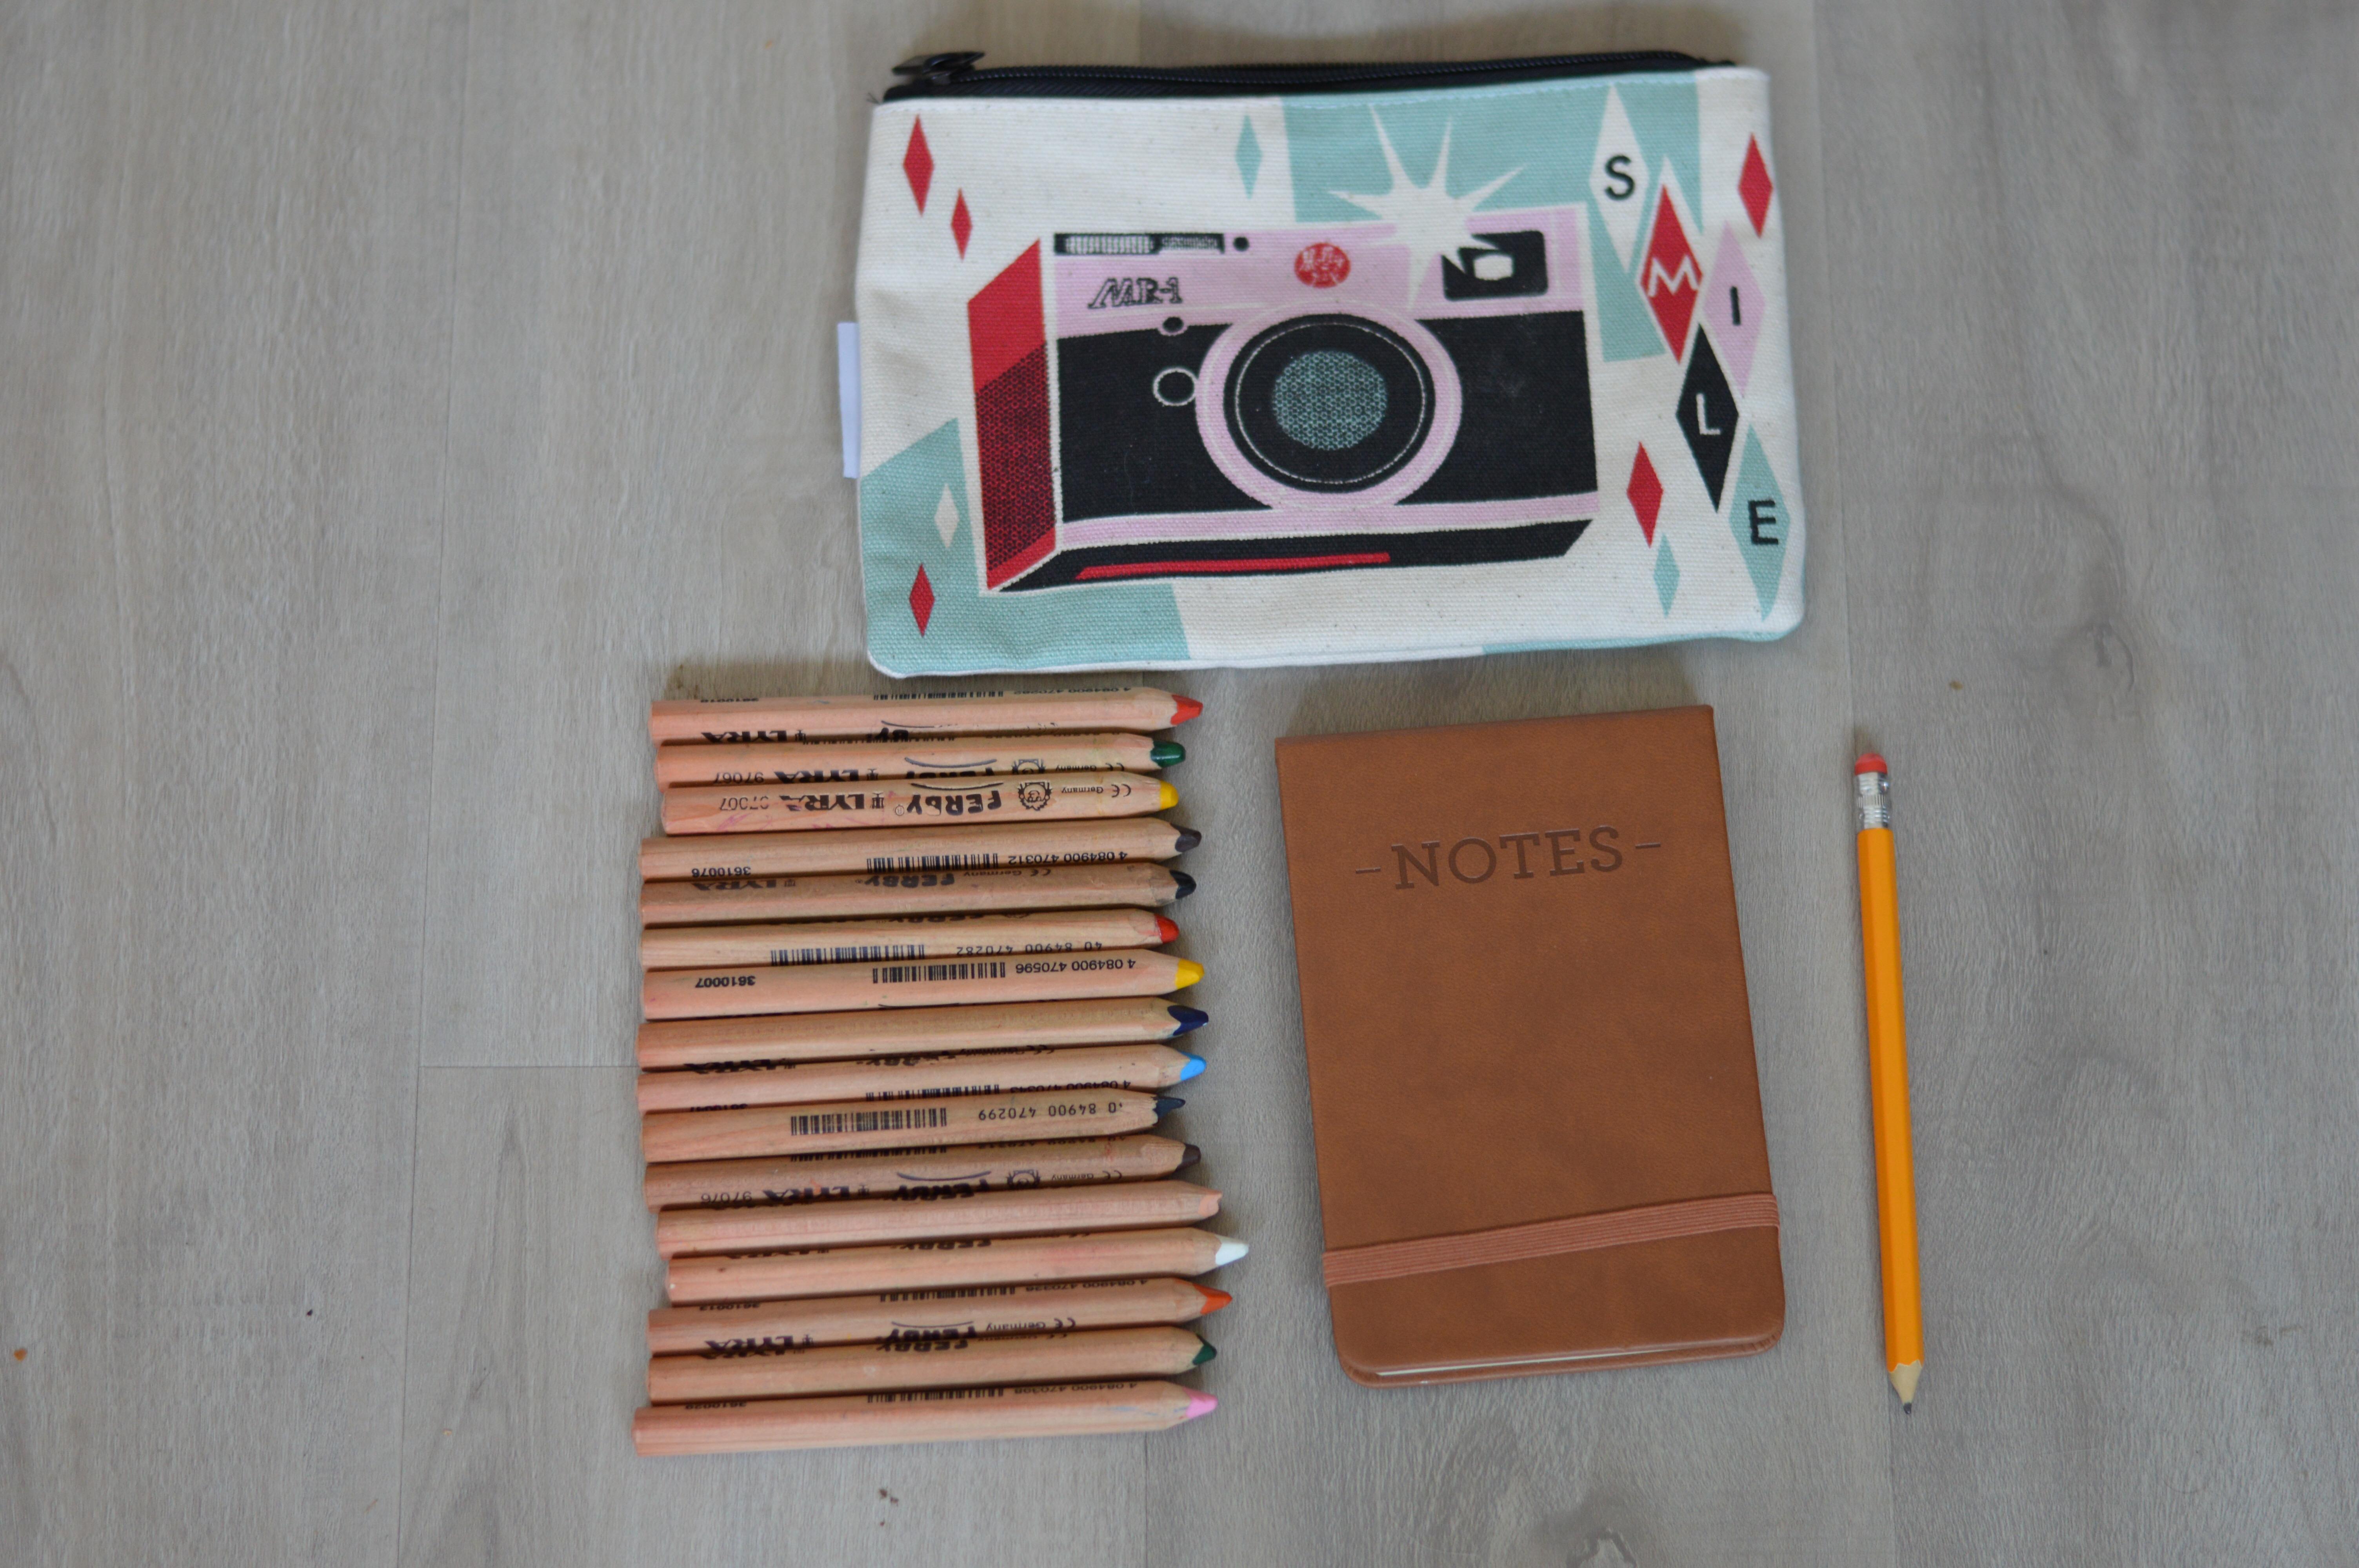 Plane travel montessori minimalist essentials our for Minimalist essentials